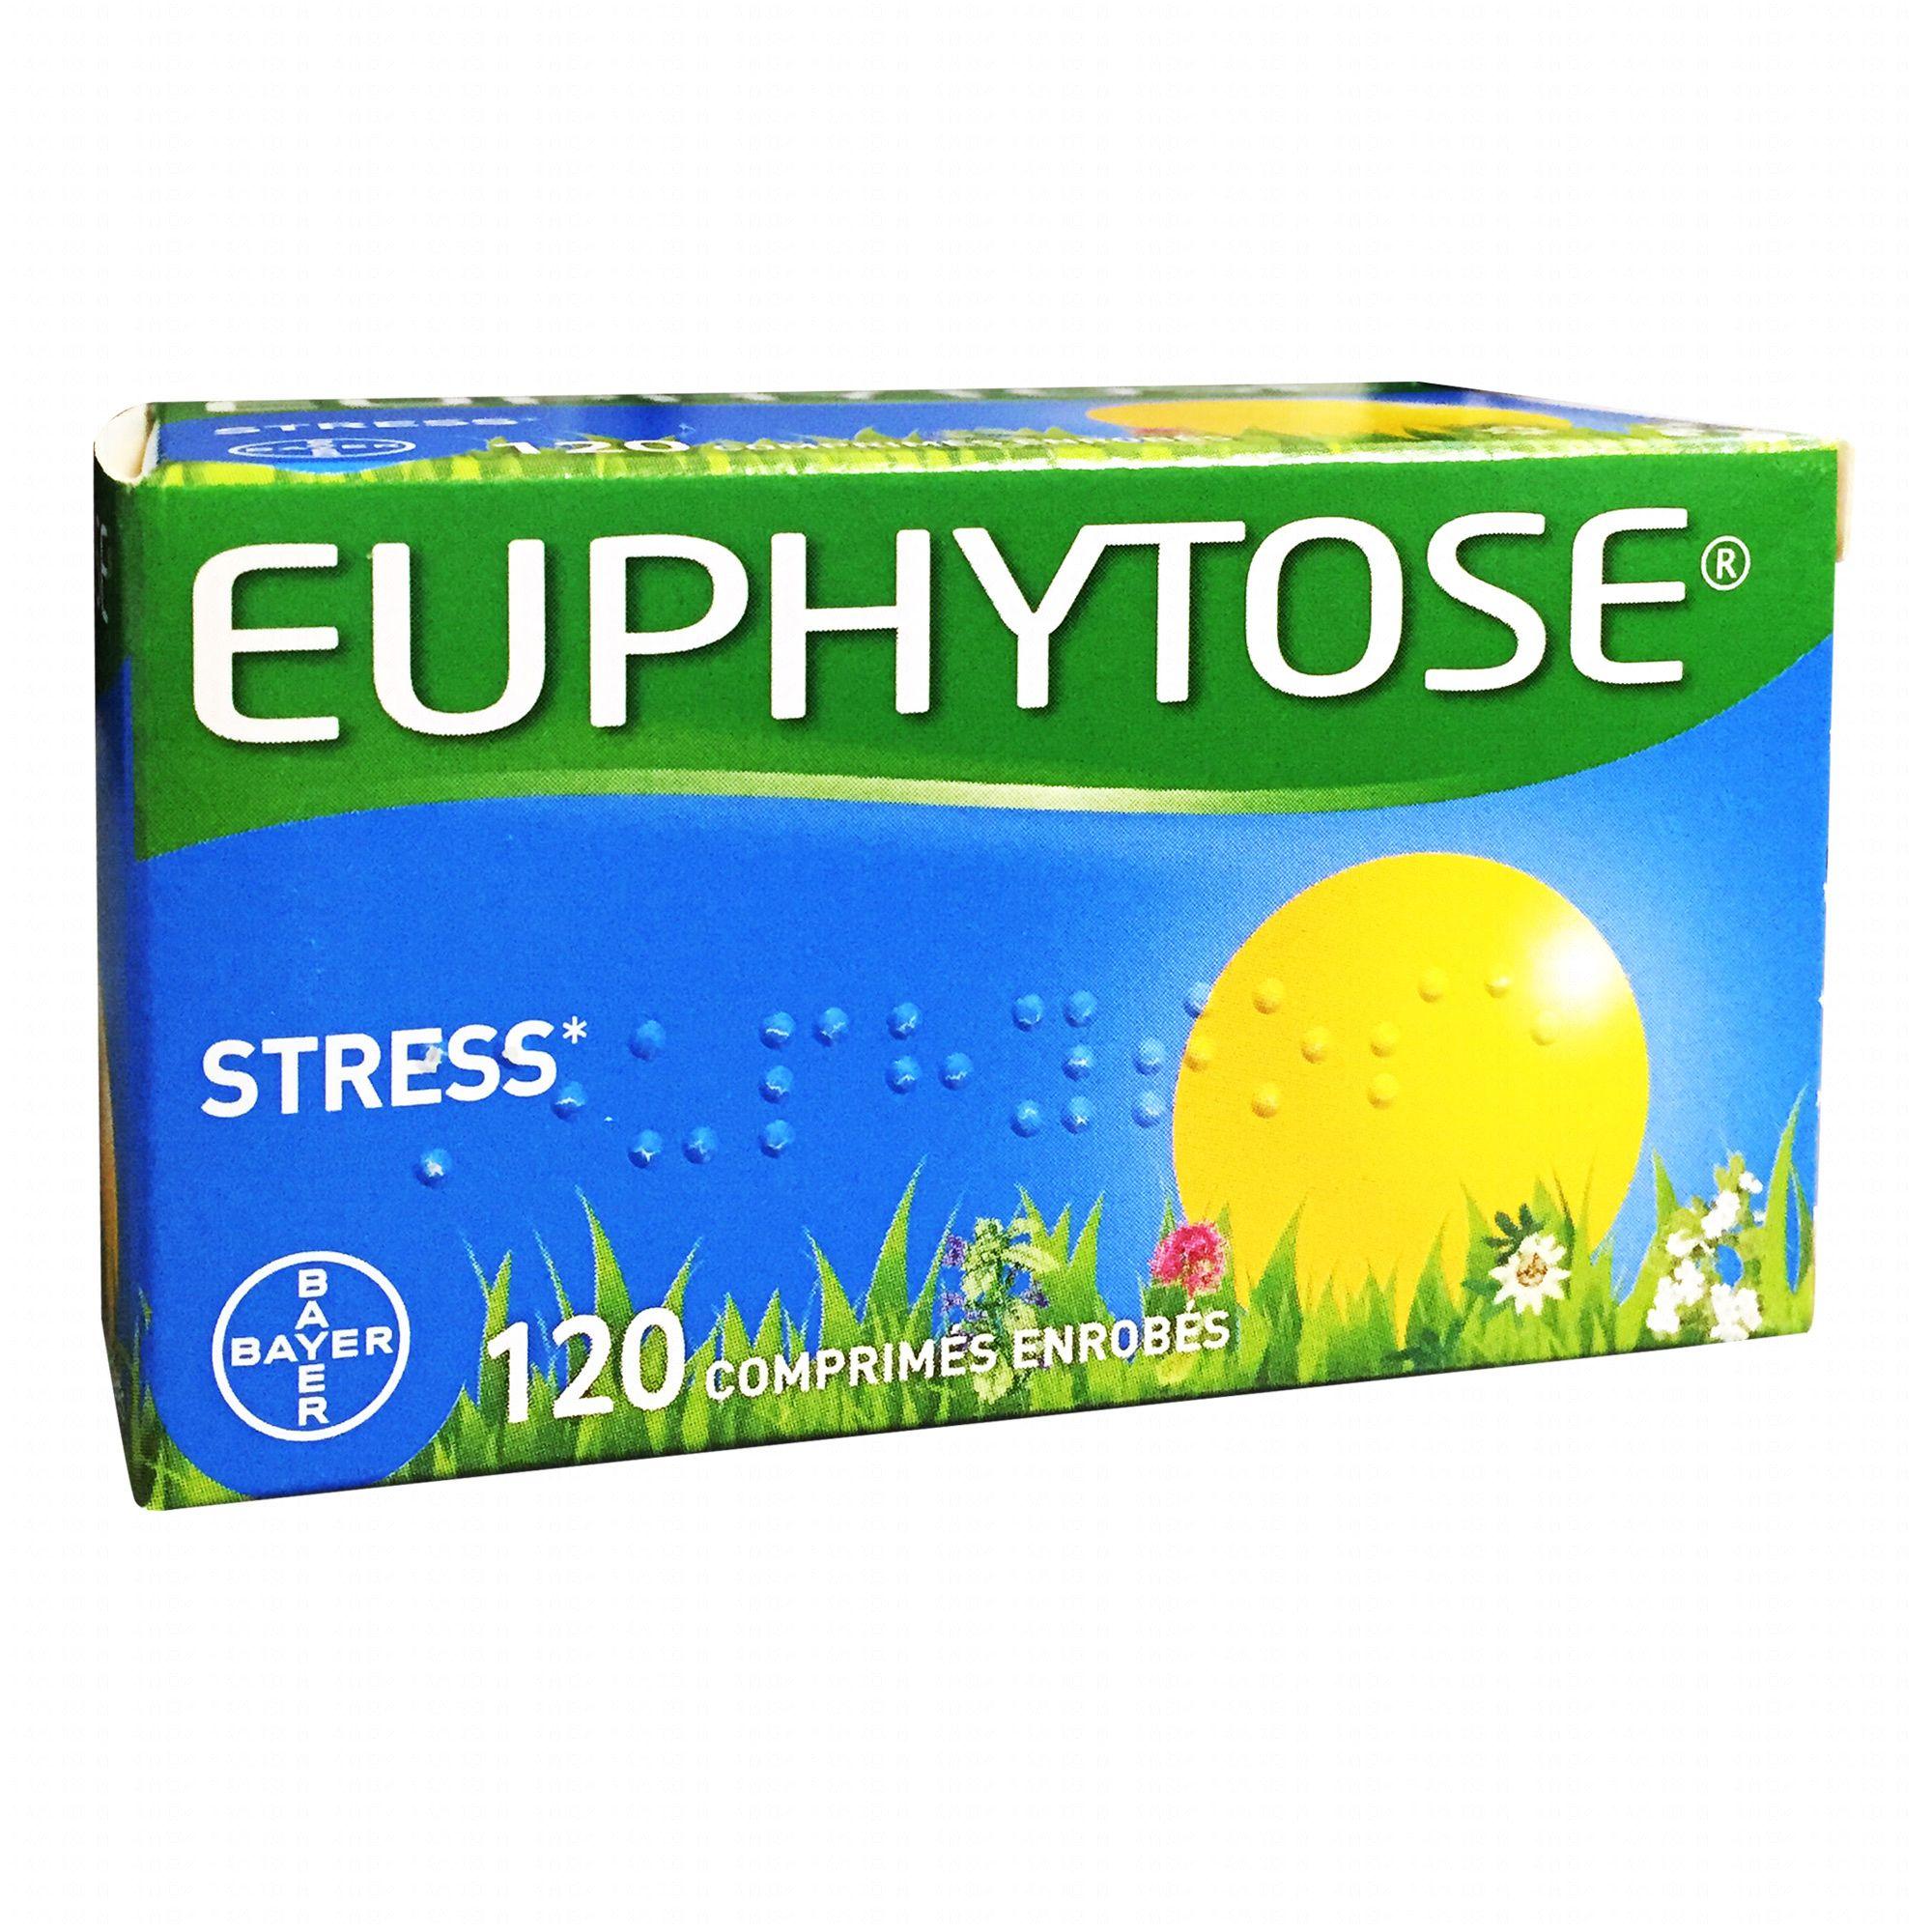 medicament euphytose